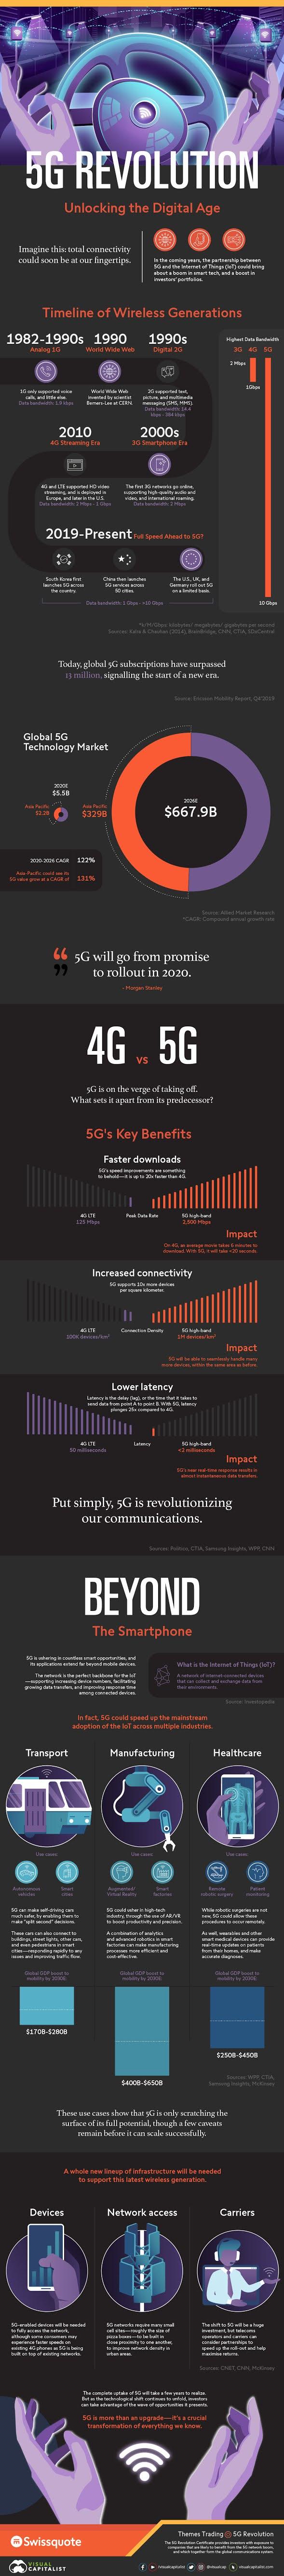 5G Revolution Unlocking the Digital Age #infographic